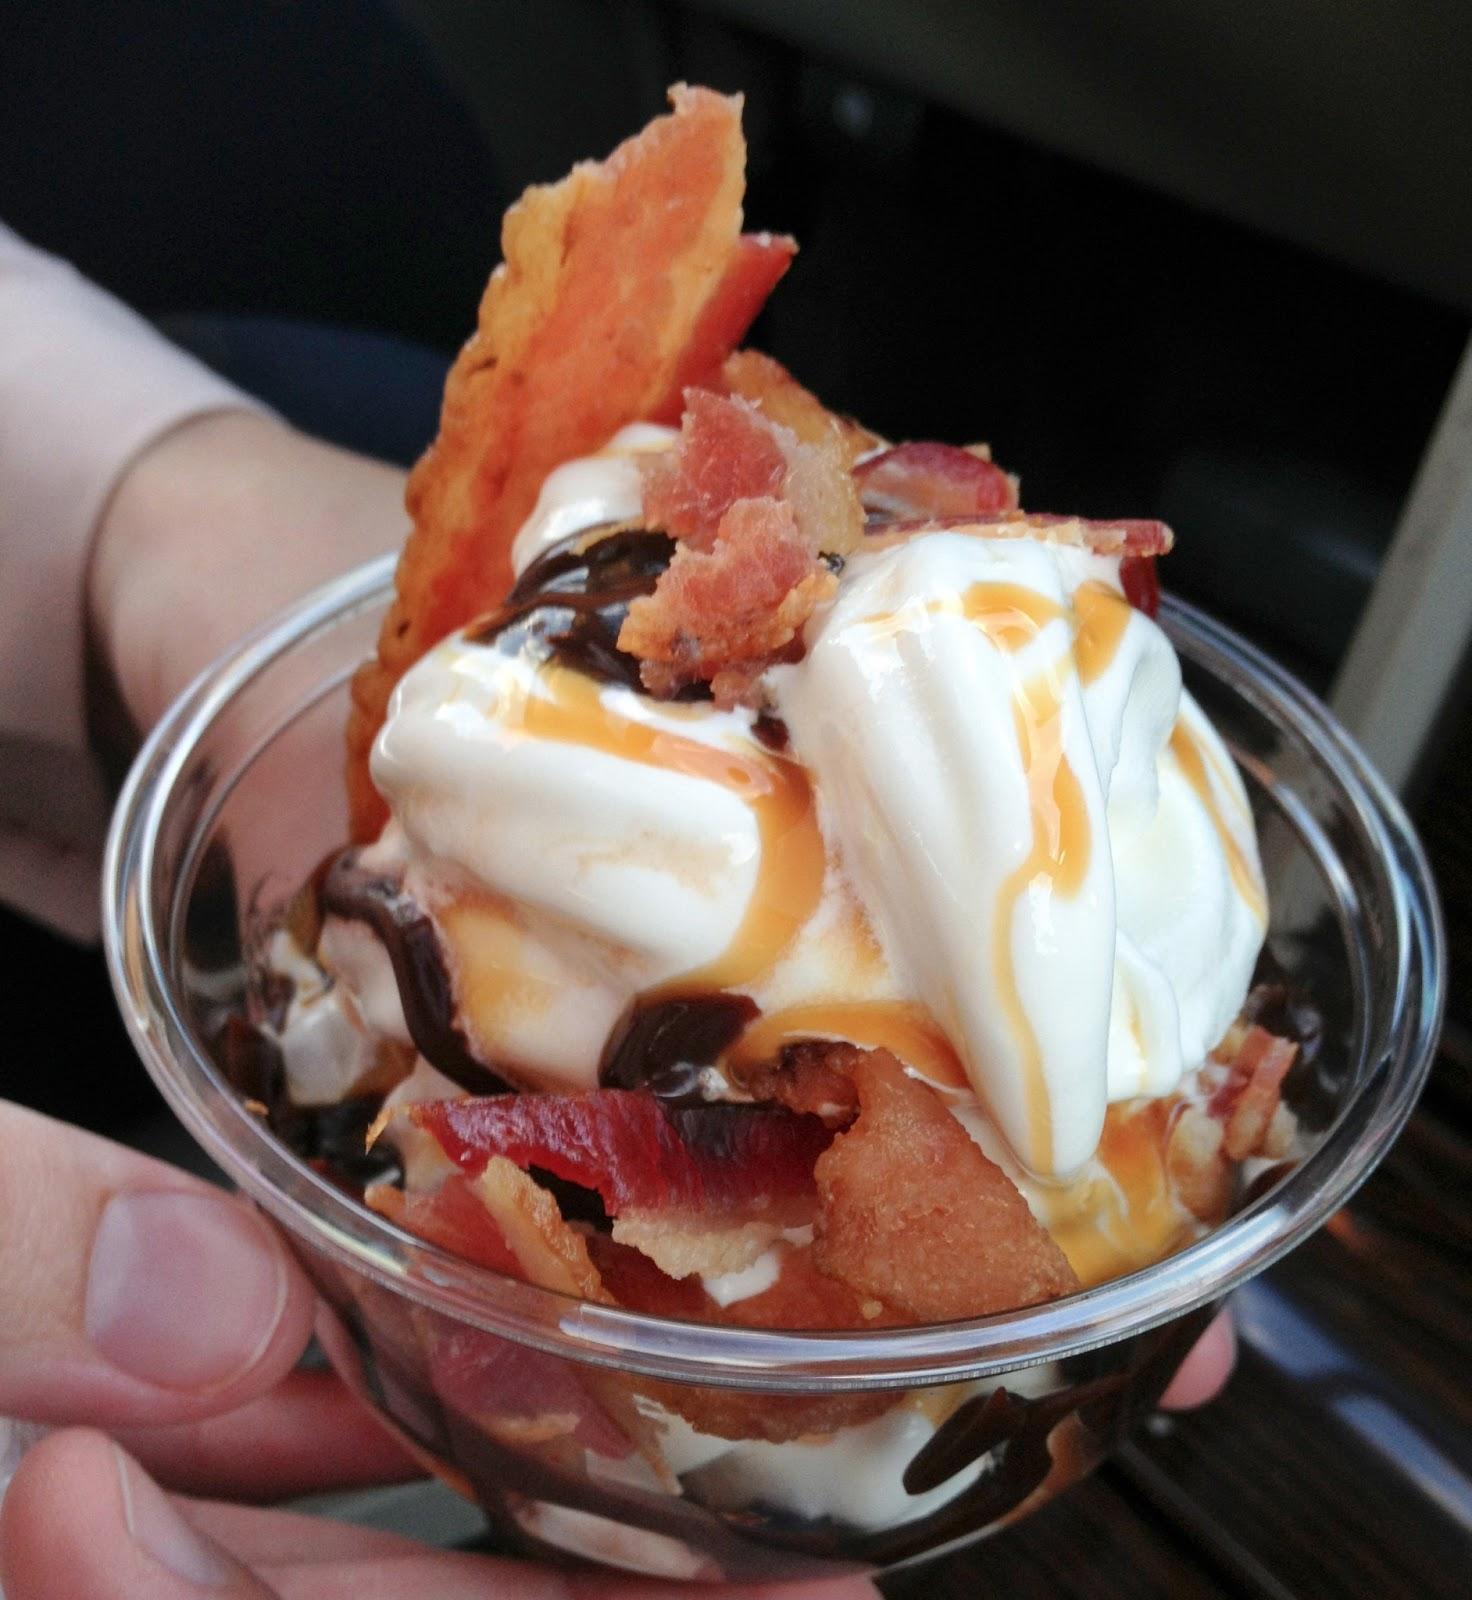 food blog, food blogger, food reviews, style blog, burger king, bacon, maple, sundae, ice cream, dessert, unique desert, maple and bacon,